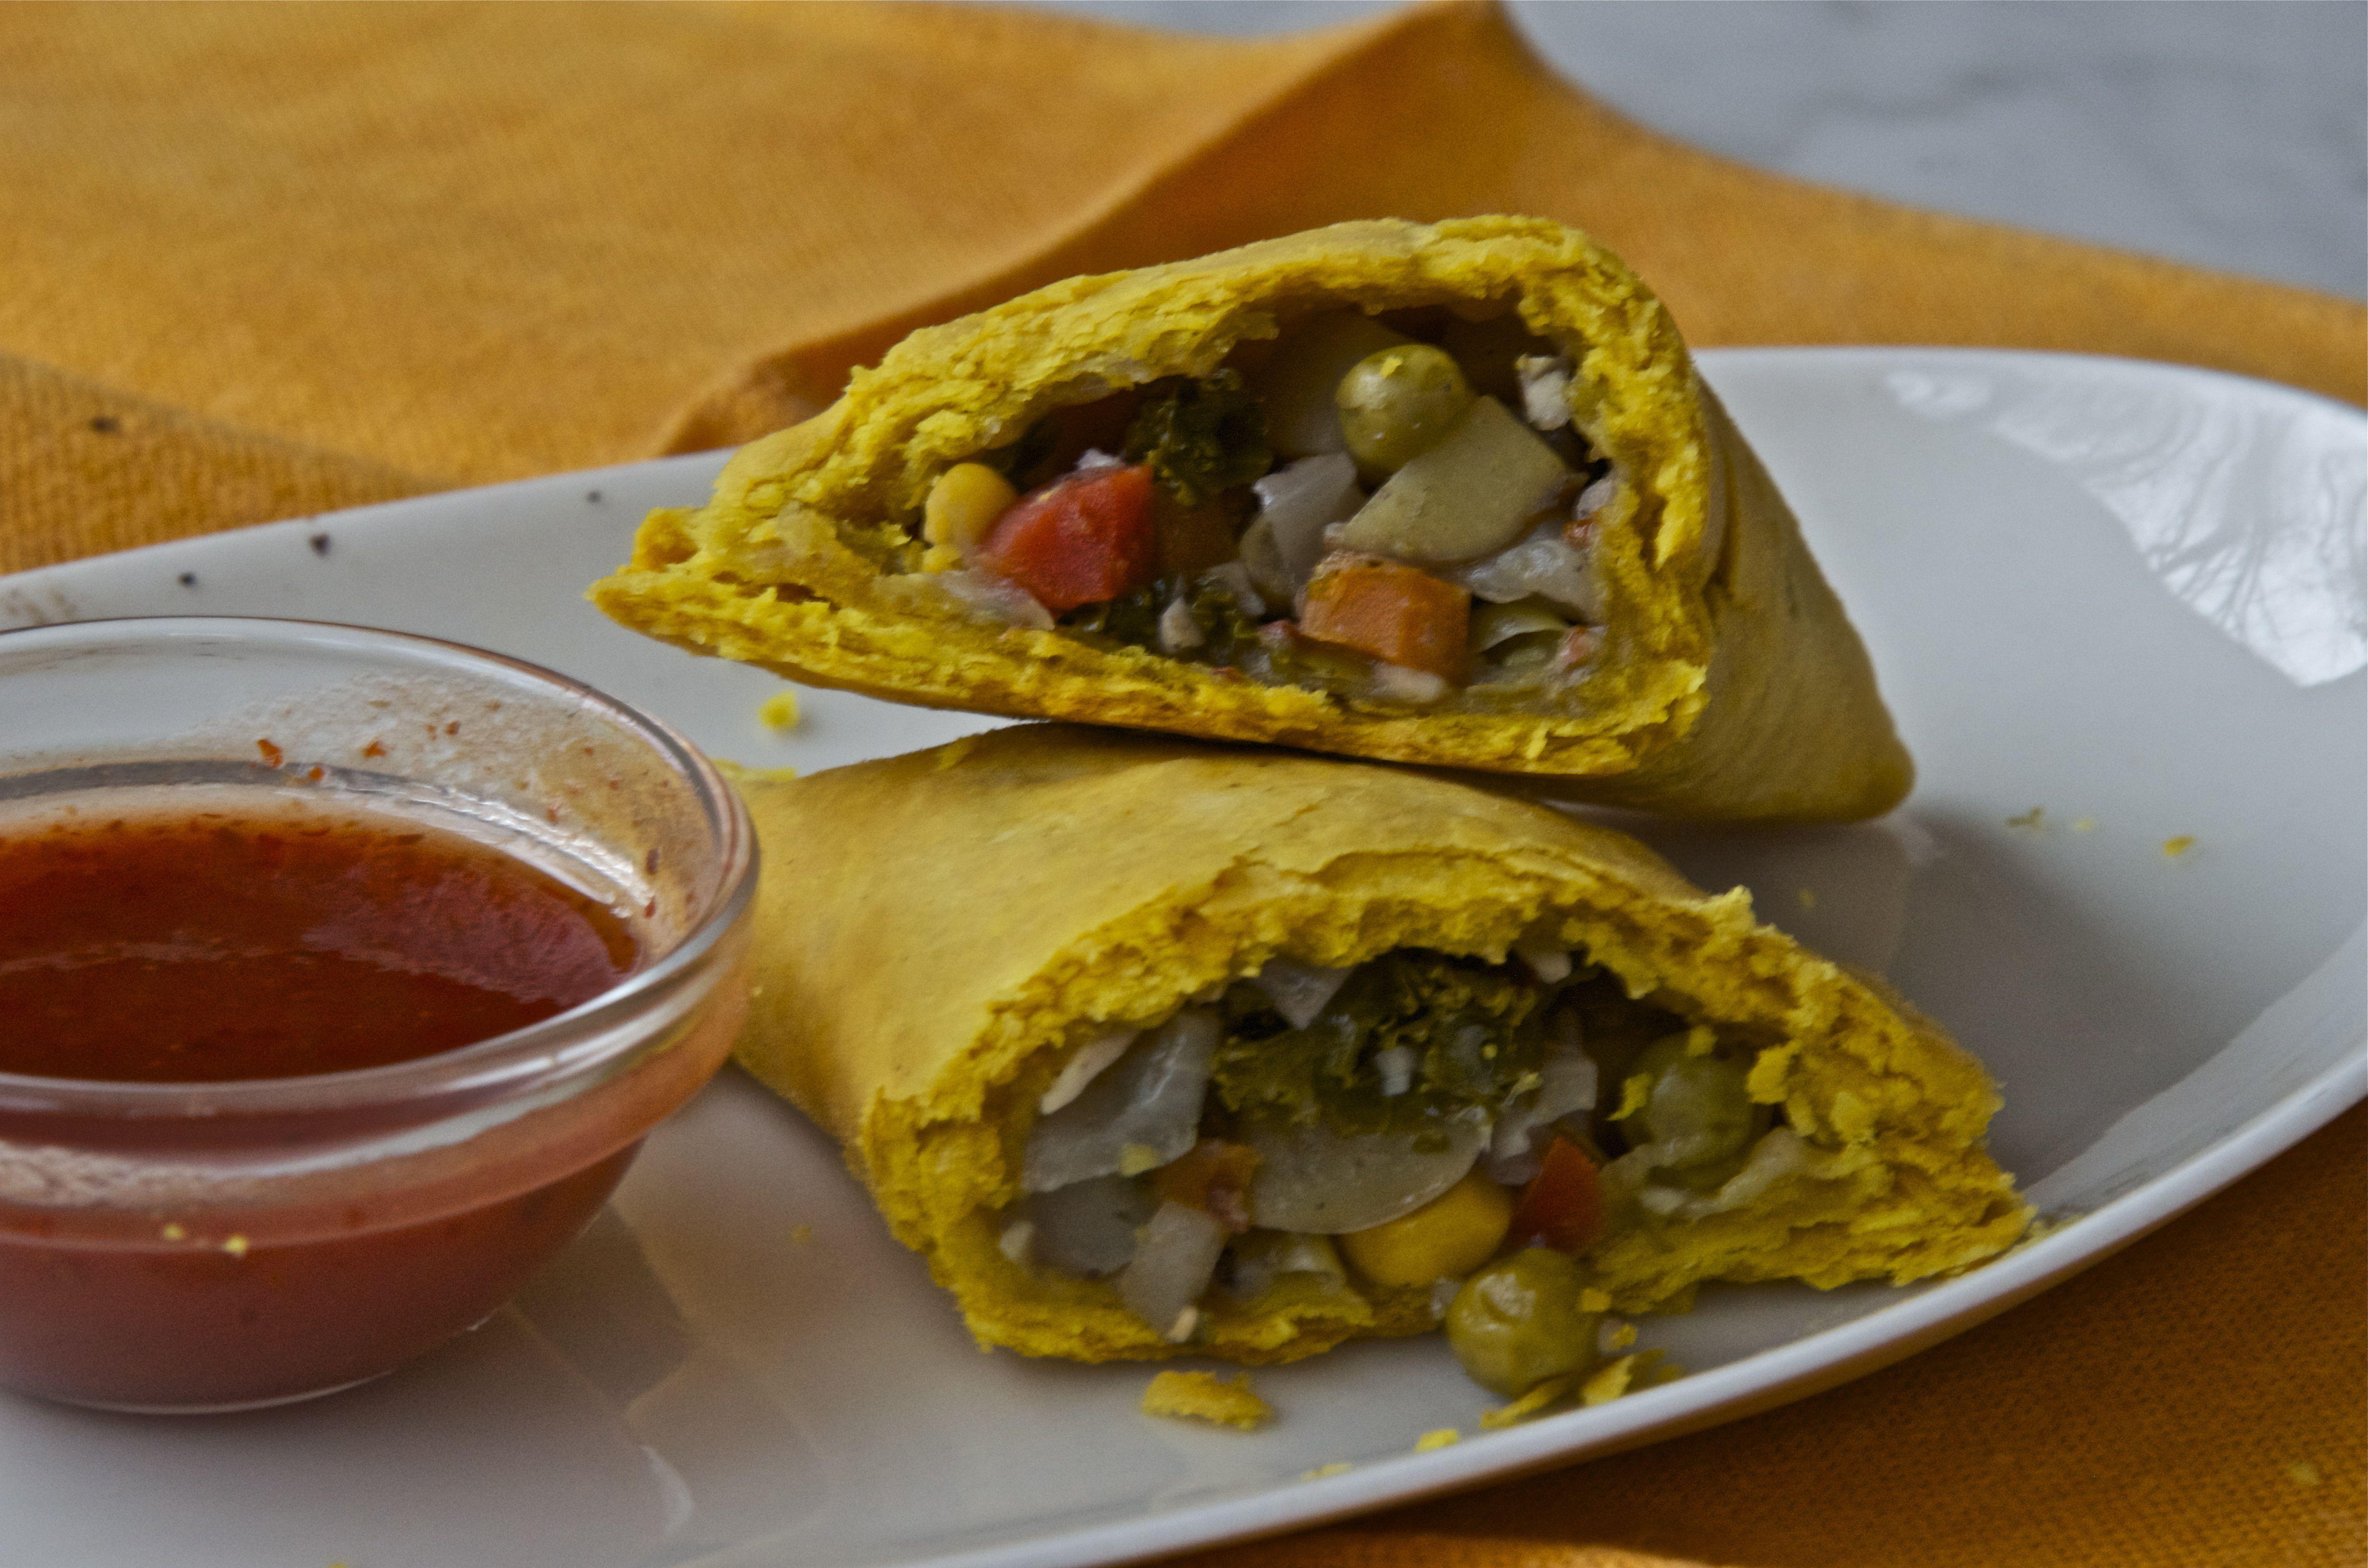 Jamaican veggie patties cobblers pies pastries